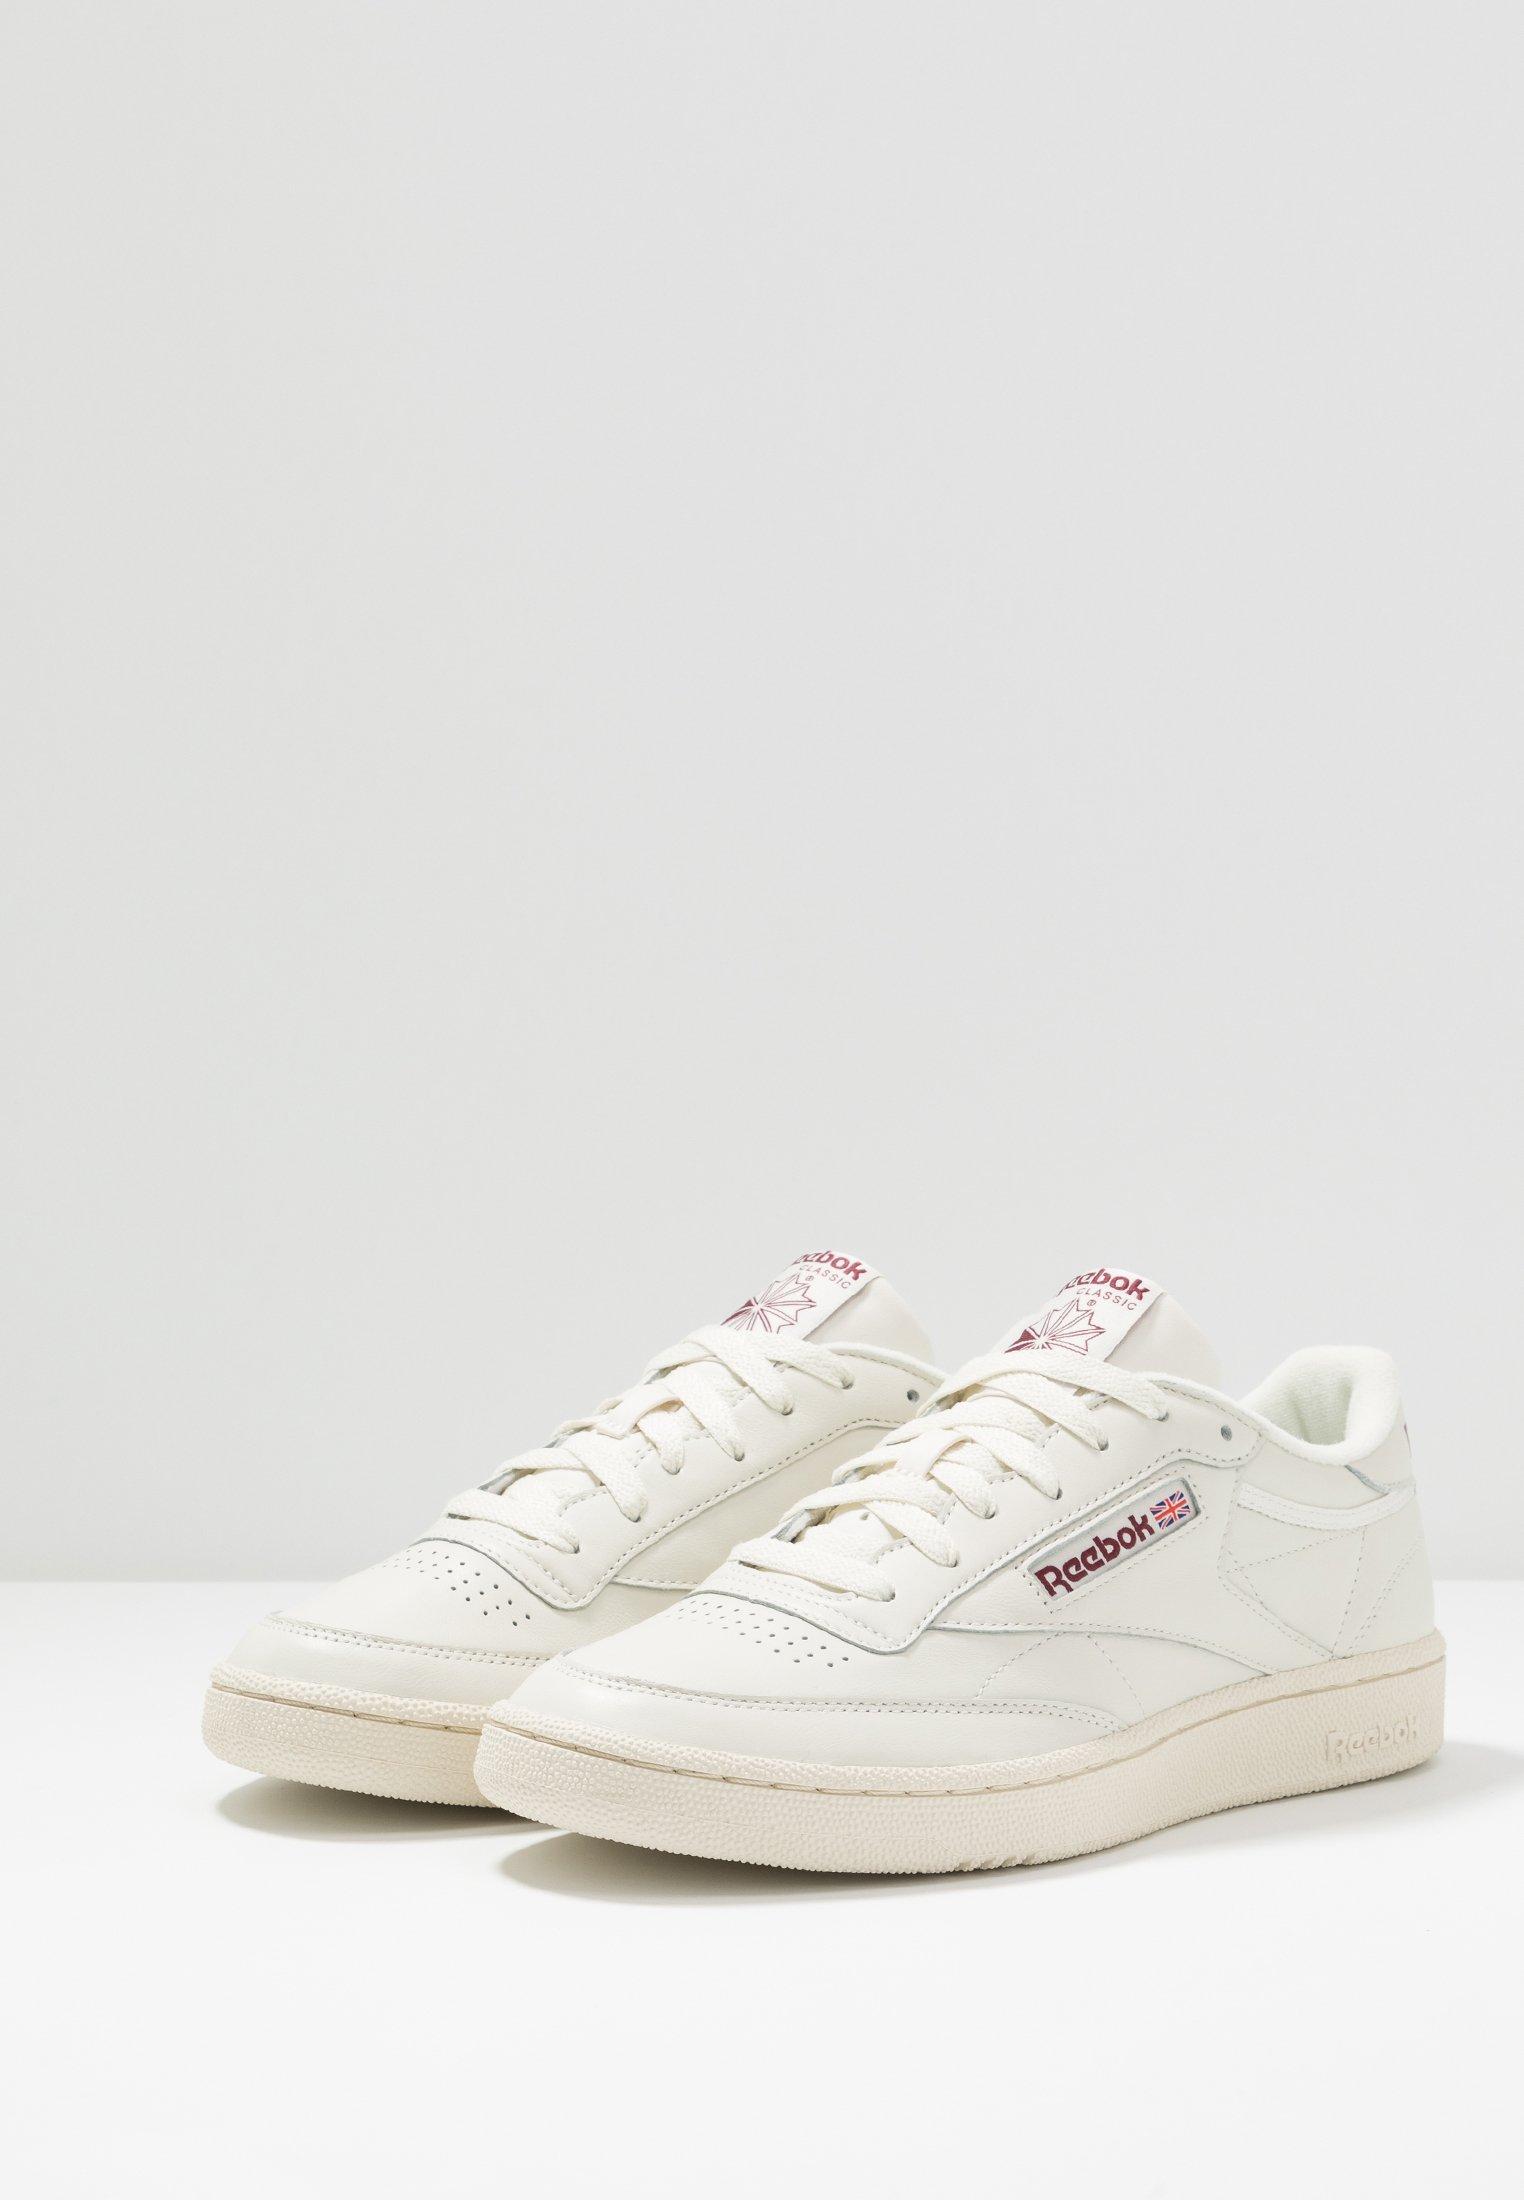 Reebok Classic CLUB C 85 Sneaker low chalk/paperwhite/maroon/offwhite